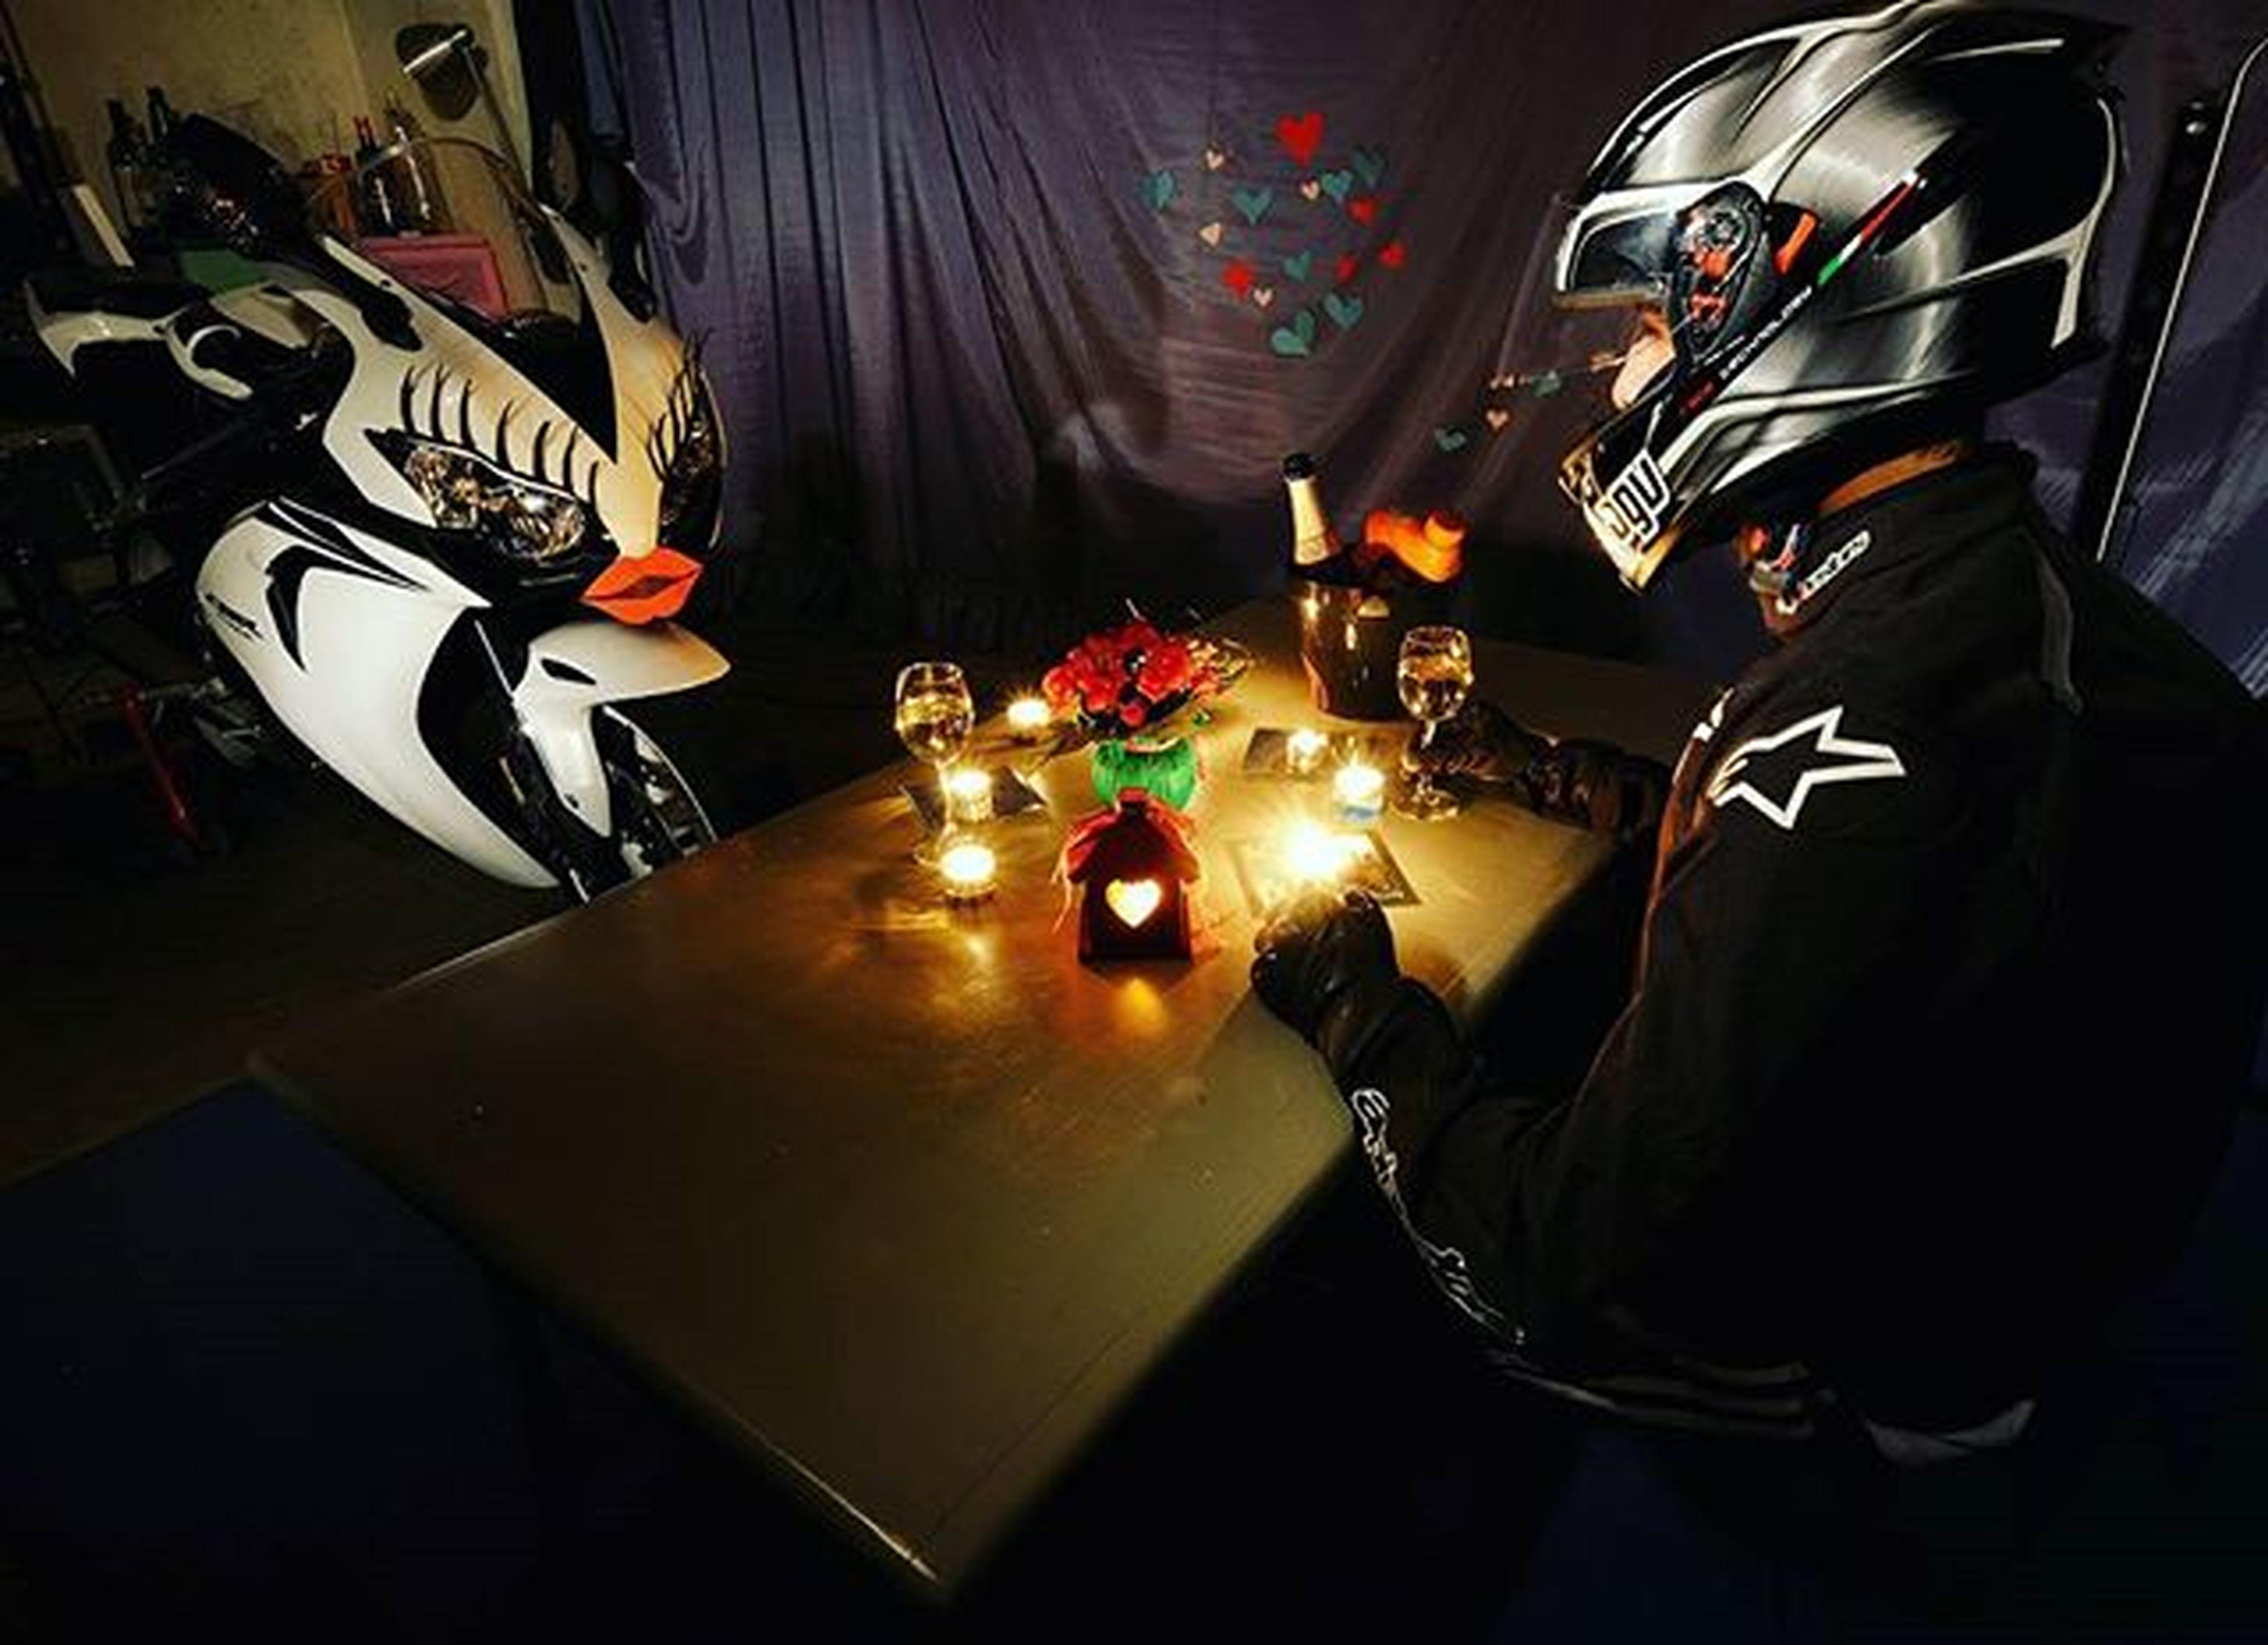 S.valentine date with my love 😉😍😘😙😗 Valentines Hondalife HondaLove Cbr_krew Cbr_nation Cbr1000rr Lovebikes Hdrpoint Lovepics Bikes Honda Racingbike Bikesofinstagram инстаграмџии ФотоНаНеделата Vscocam Fujixt1 Fujifilm_xseries Fujifilm Vscomacedonia